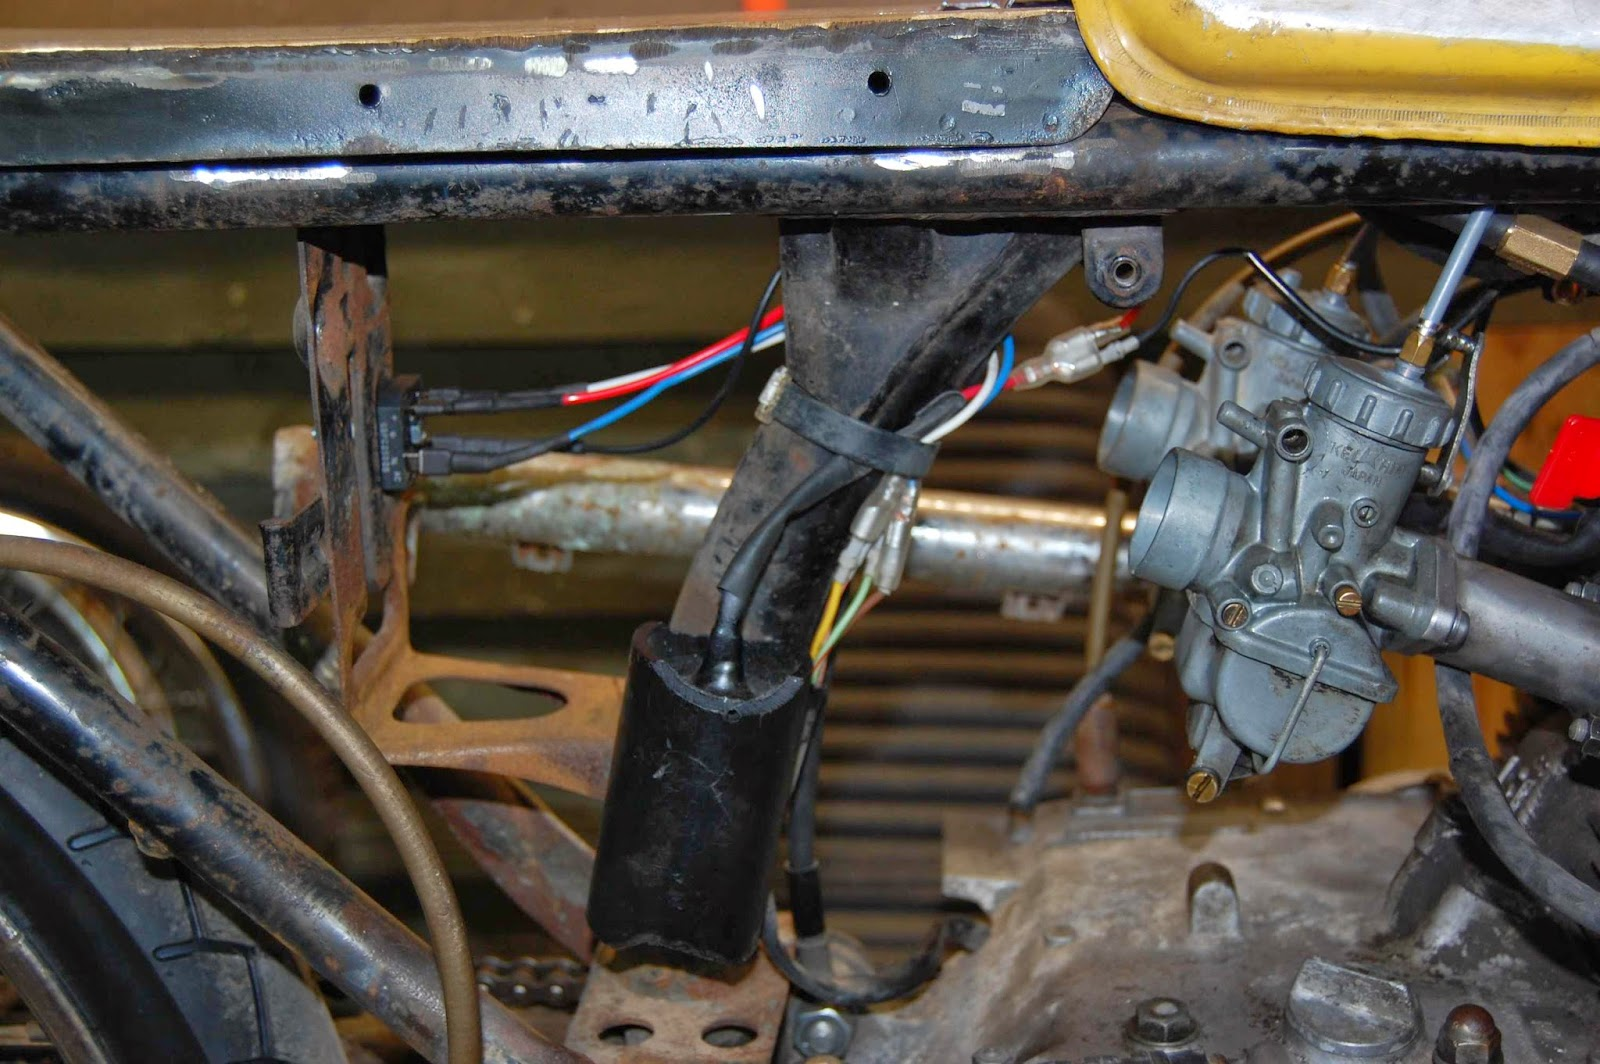 honda ca95 wiring wiring diagram technic honda ca95 wiring [ 1600 x 1064 Pixel ]